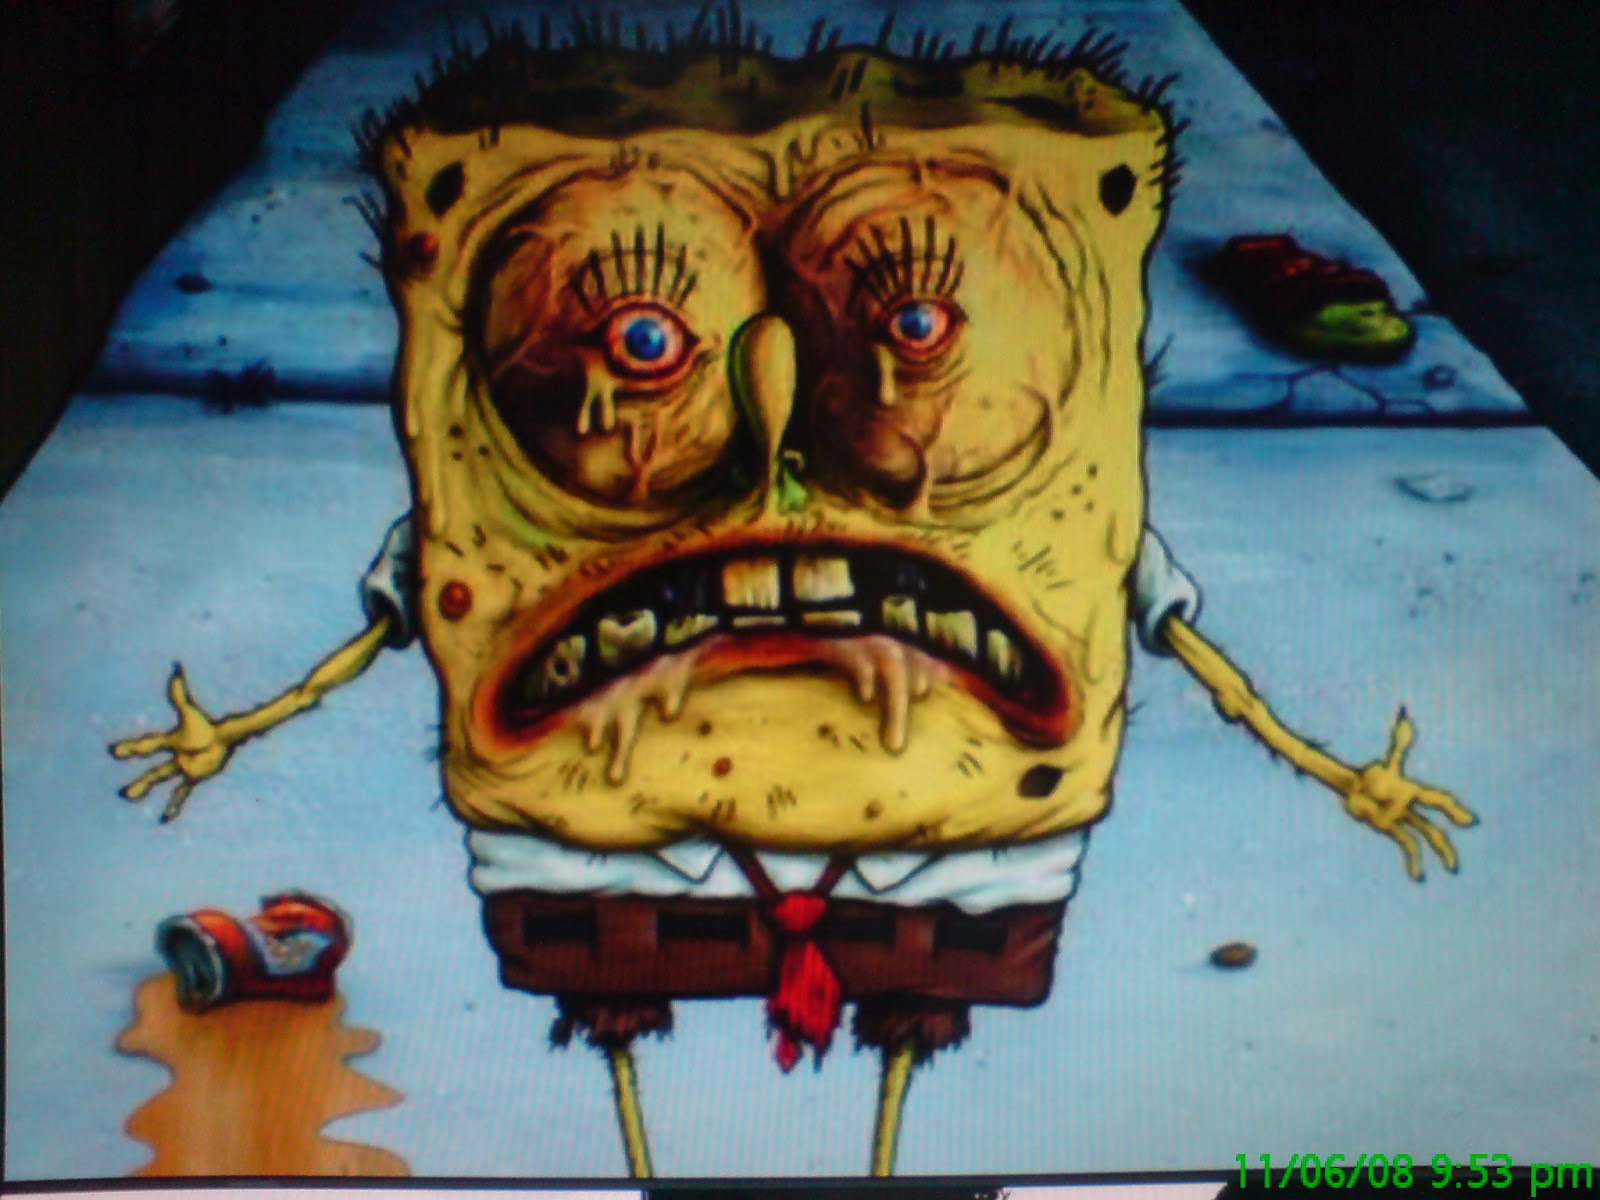 Scary Spongebob Pictures